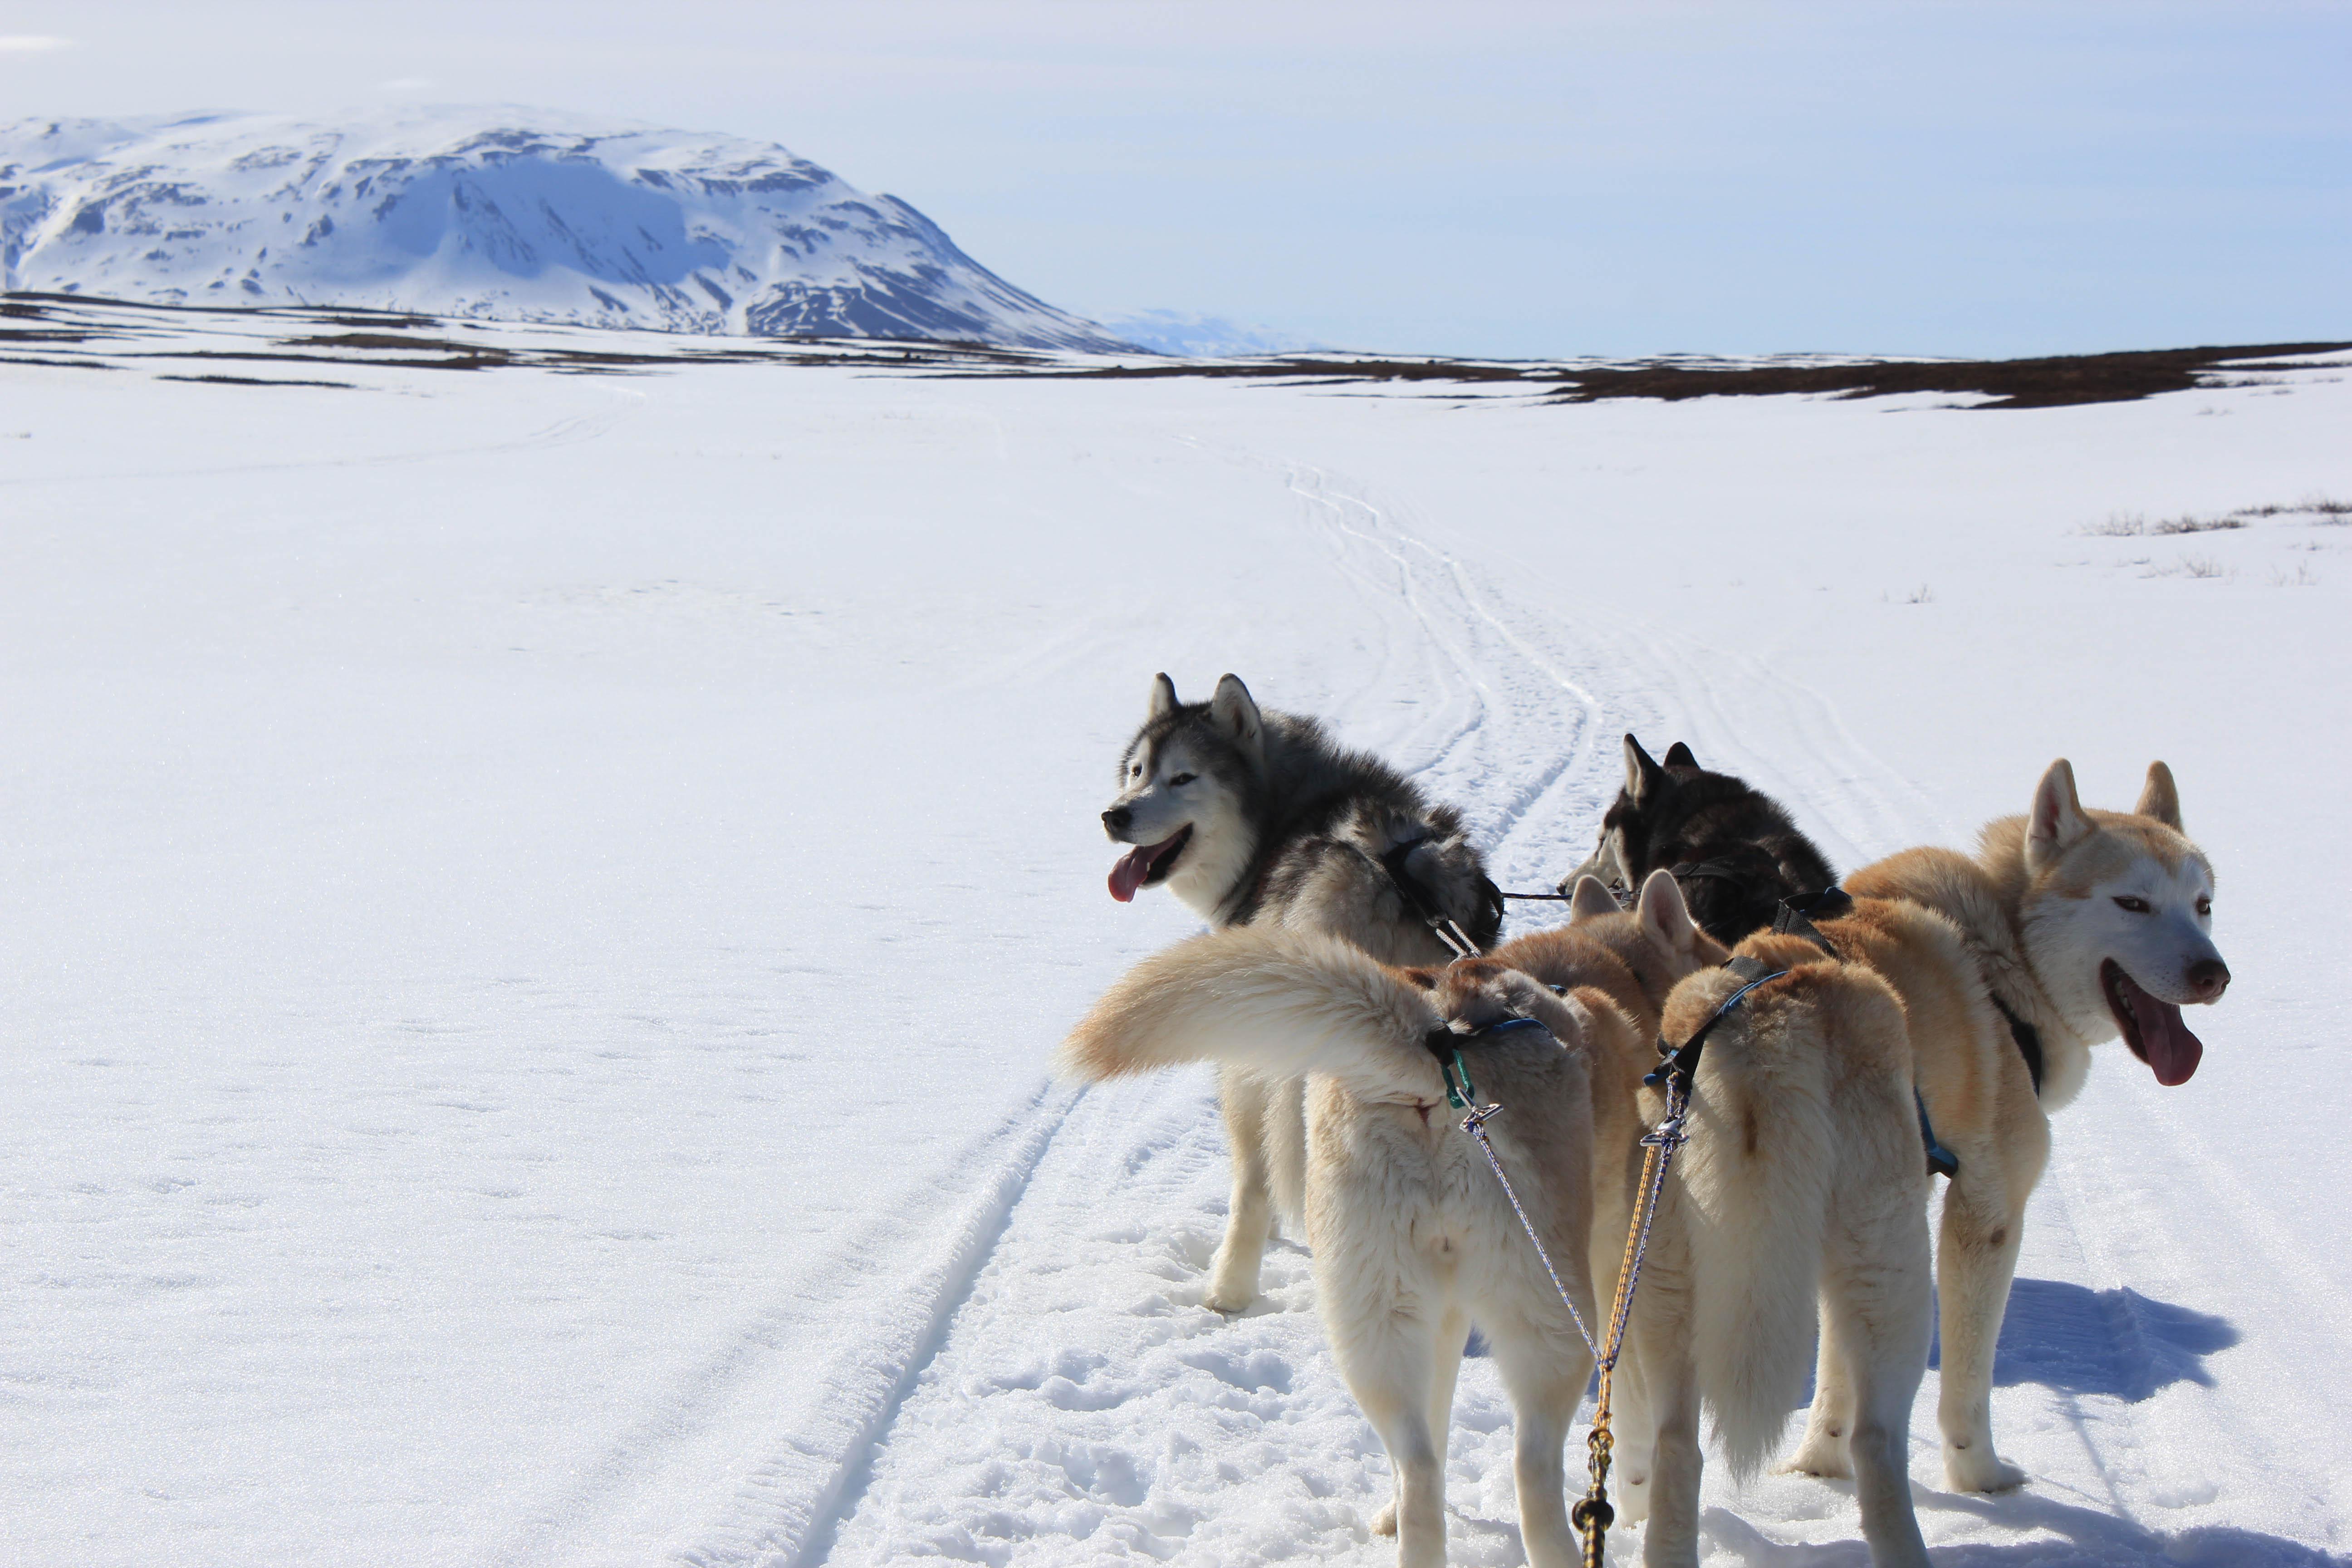 Denne slædetur med Siberian Husky er perfekt for dem, der elsker dyr, eventyr og spektakulær natur.